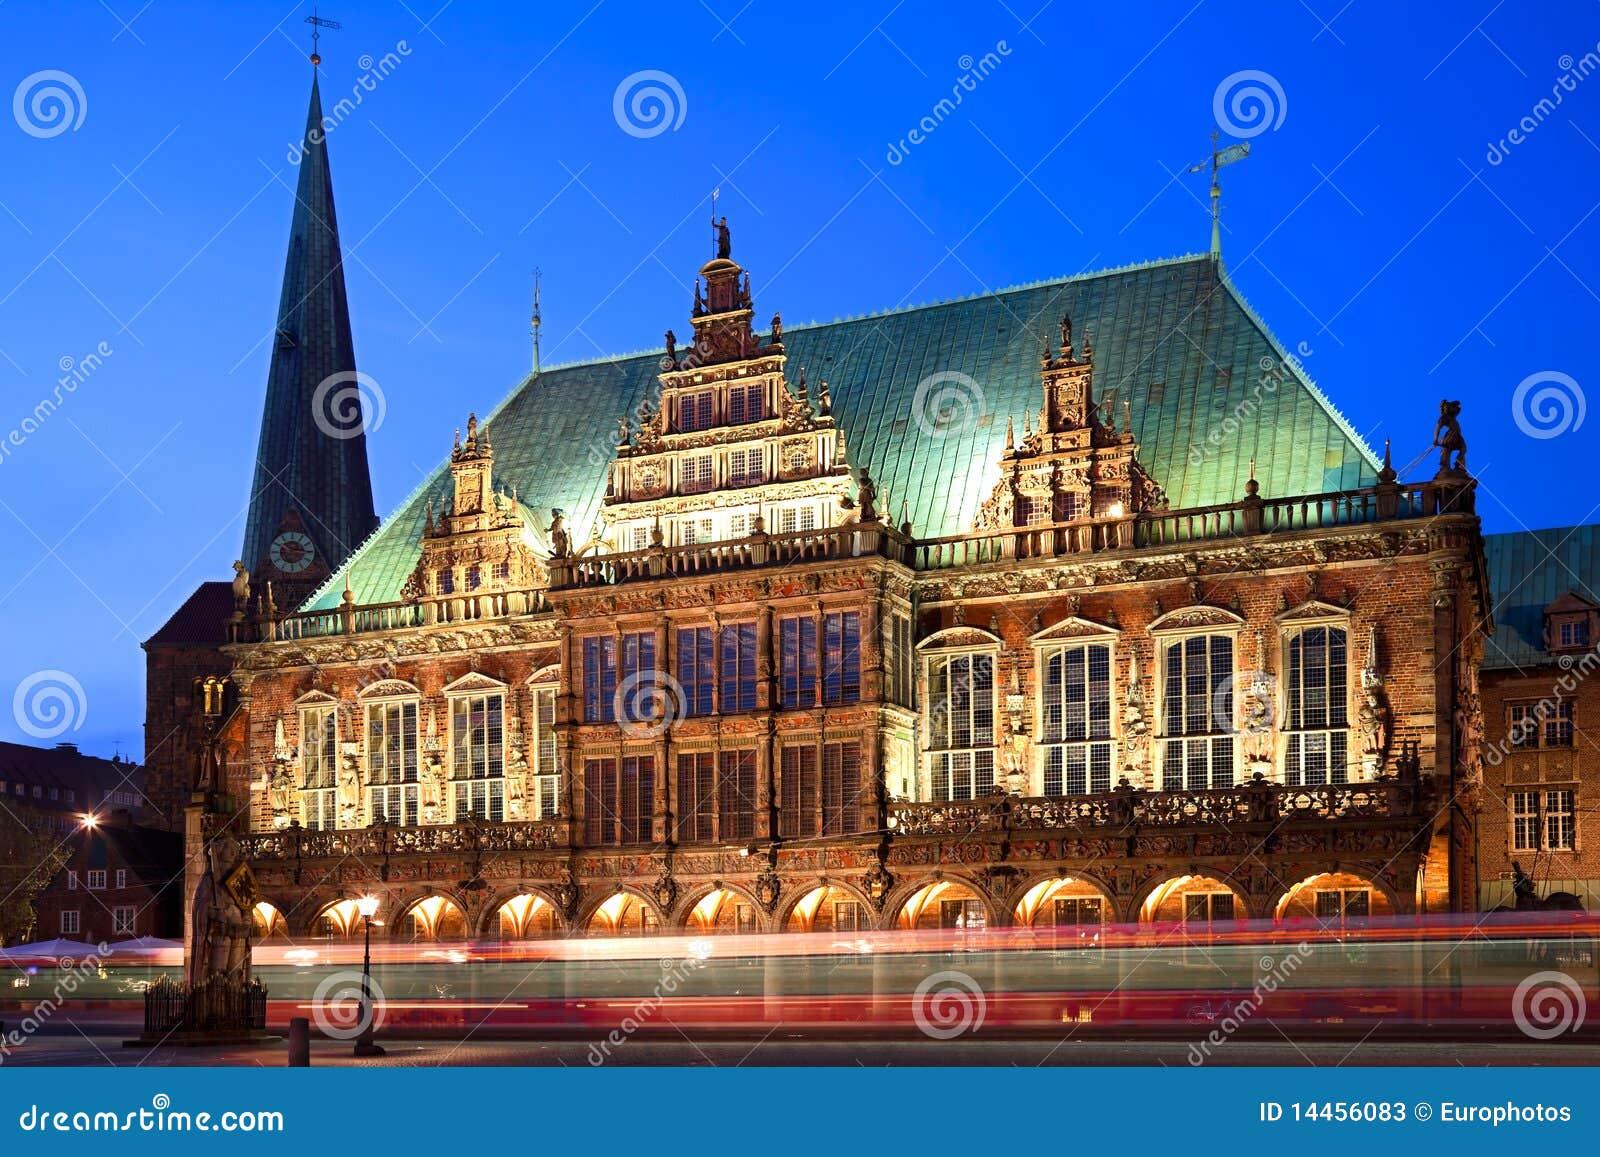 Townhall στη Βρέμη, Γερμανία.